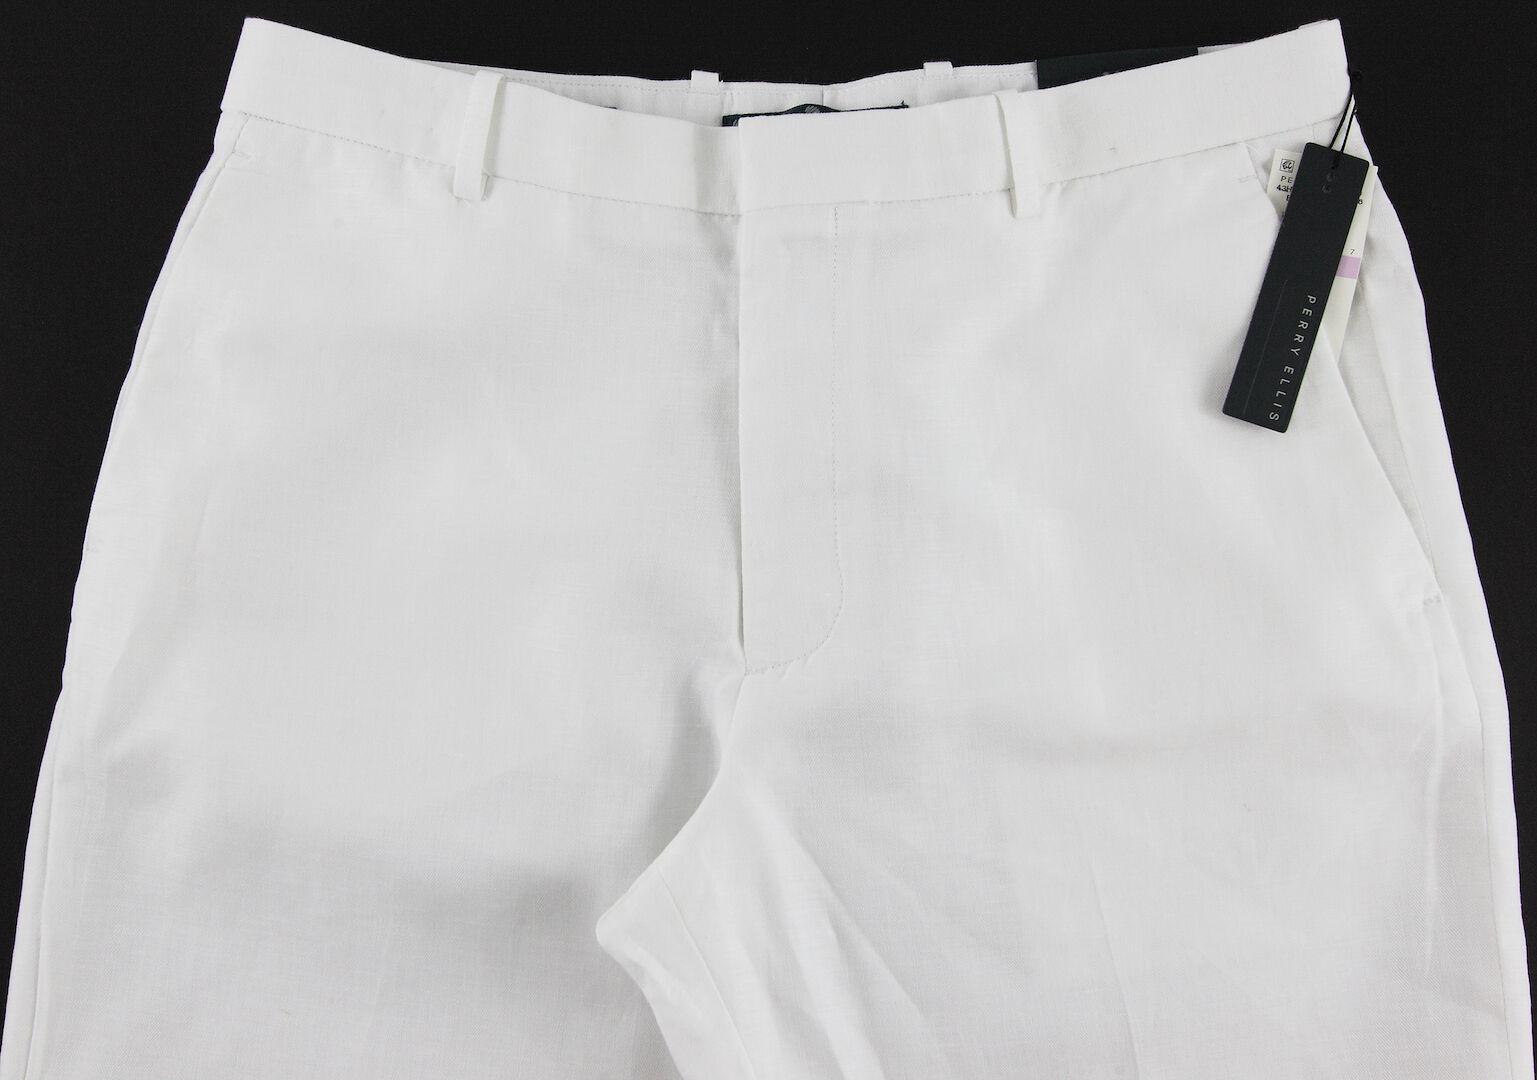 Men's PERRY ELLIS White Casual Dress Linen Cotton Pants 30x30 30 NWT NEW Wow